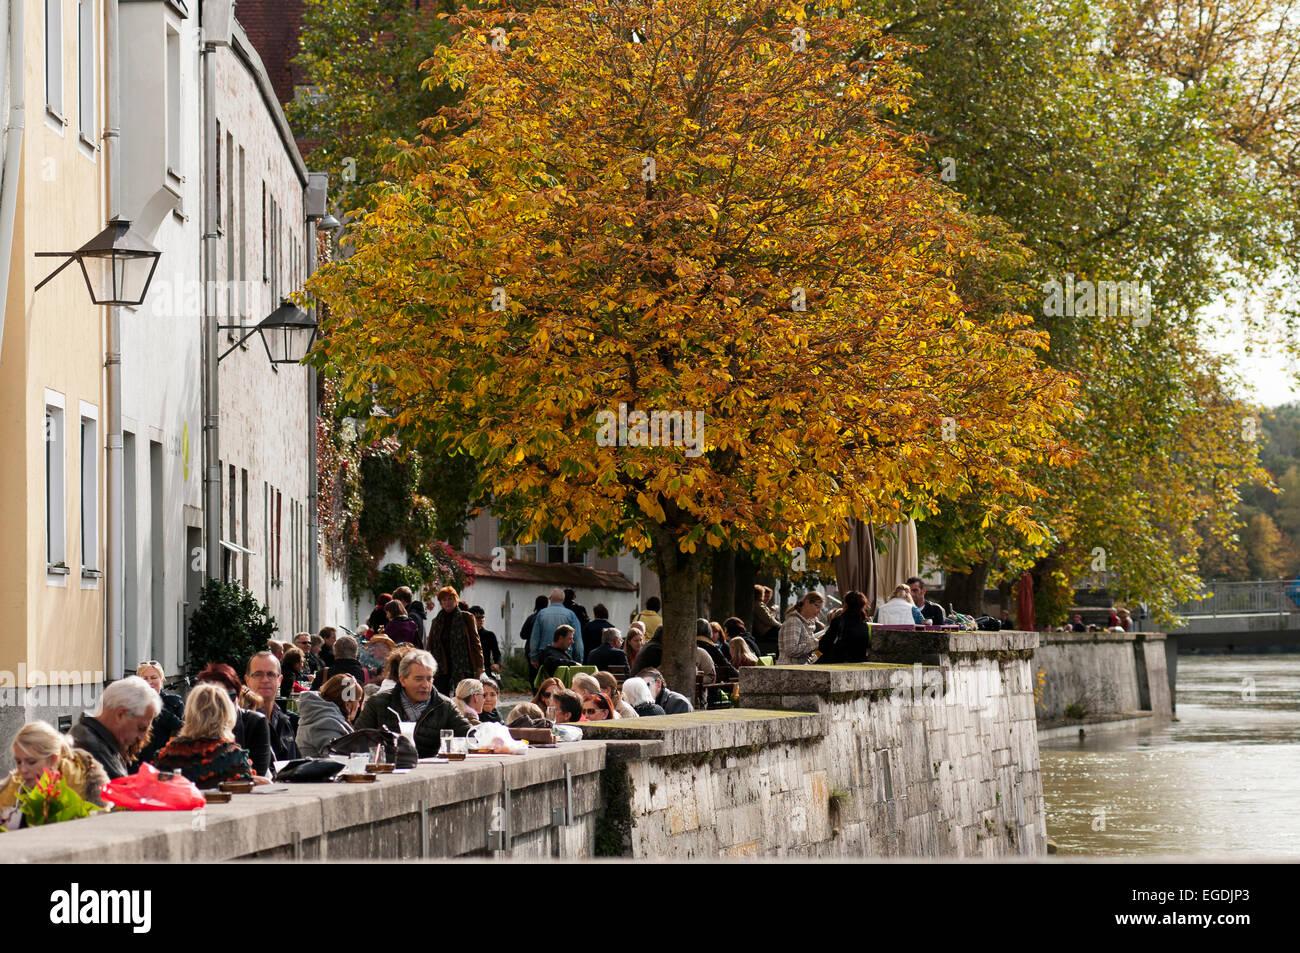 Cafe on the banks of the river Lech, Landsberg am Lech, Upper Bavaria, Bavaria, Germany - Stock Image